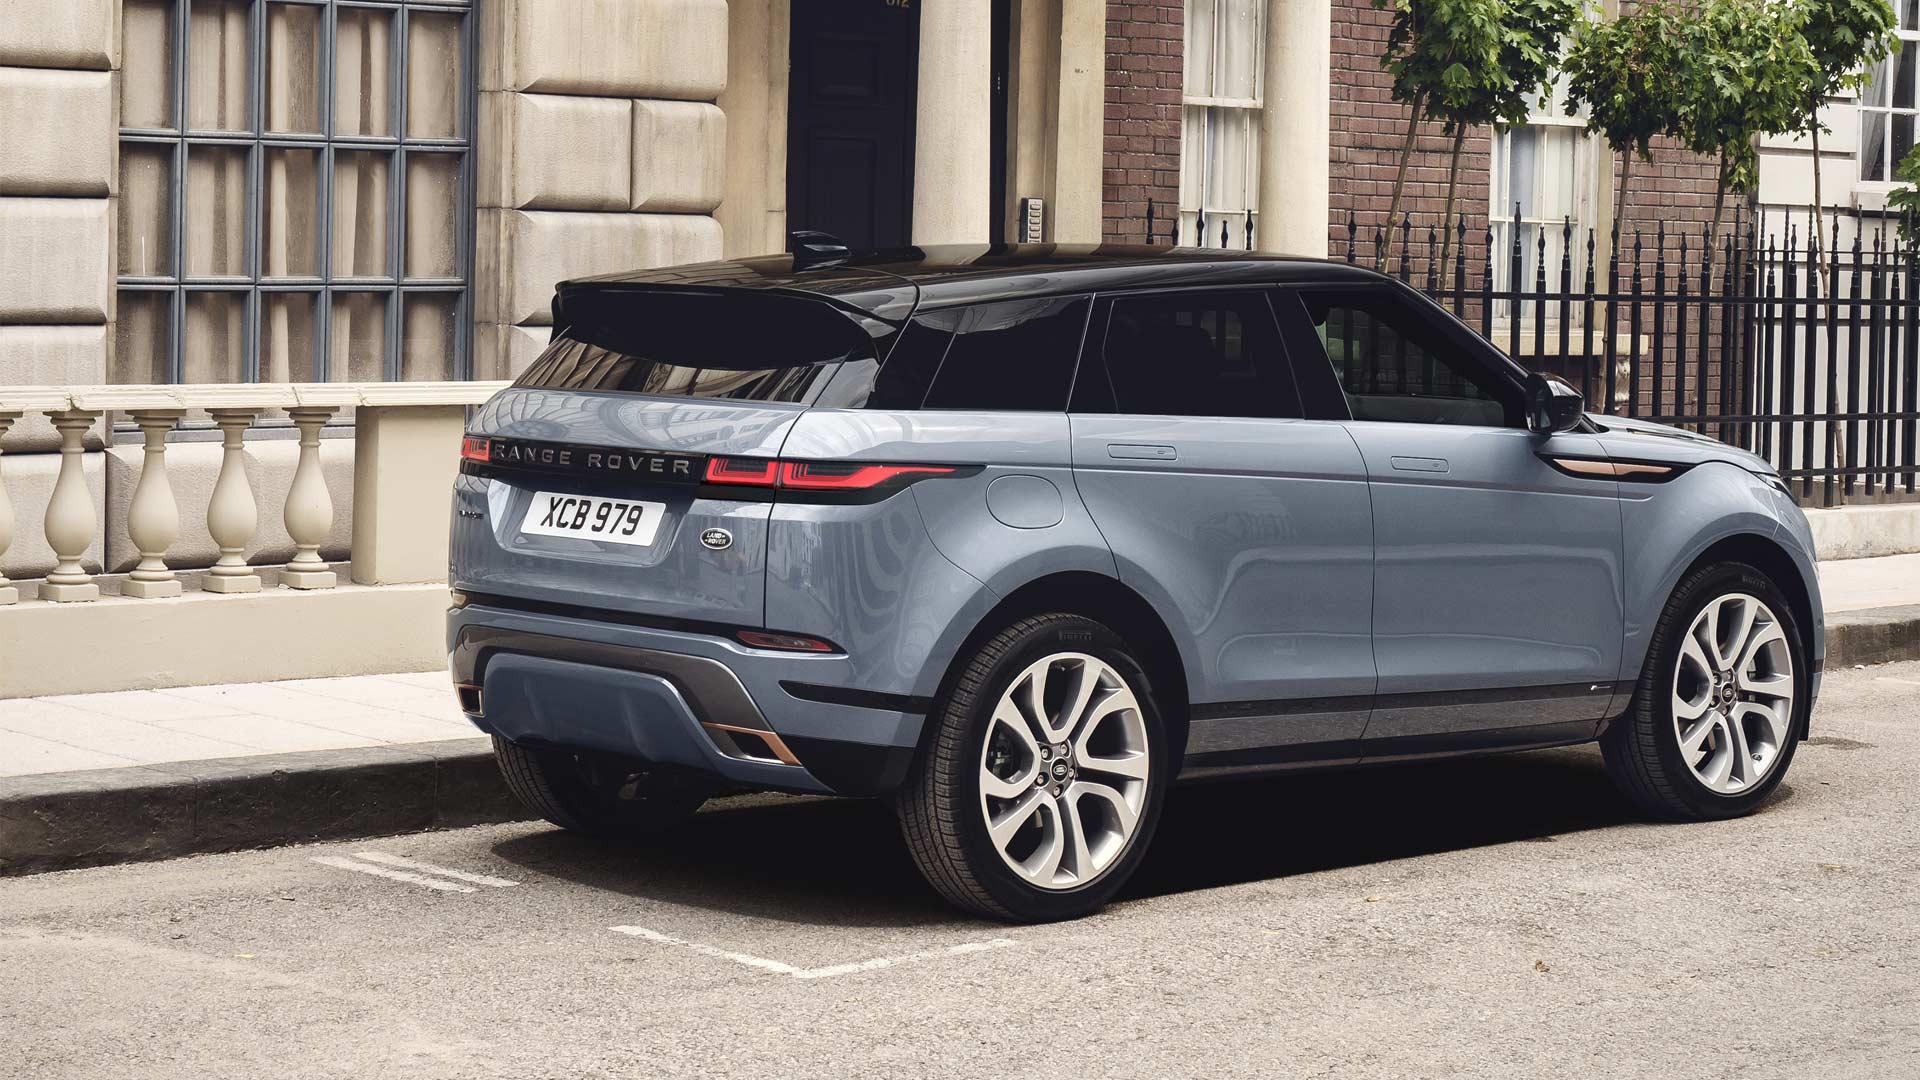 2020-Range-Rover-Evoque_3